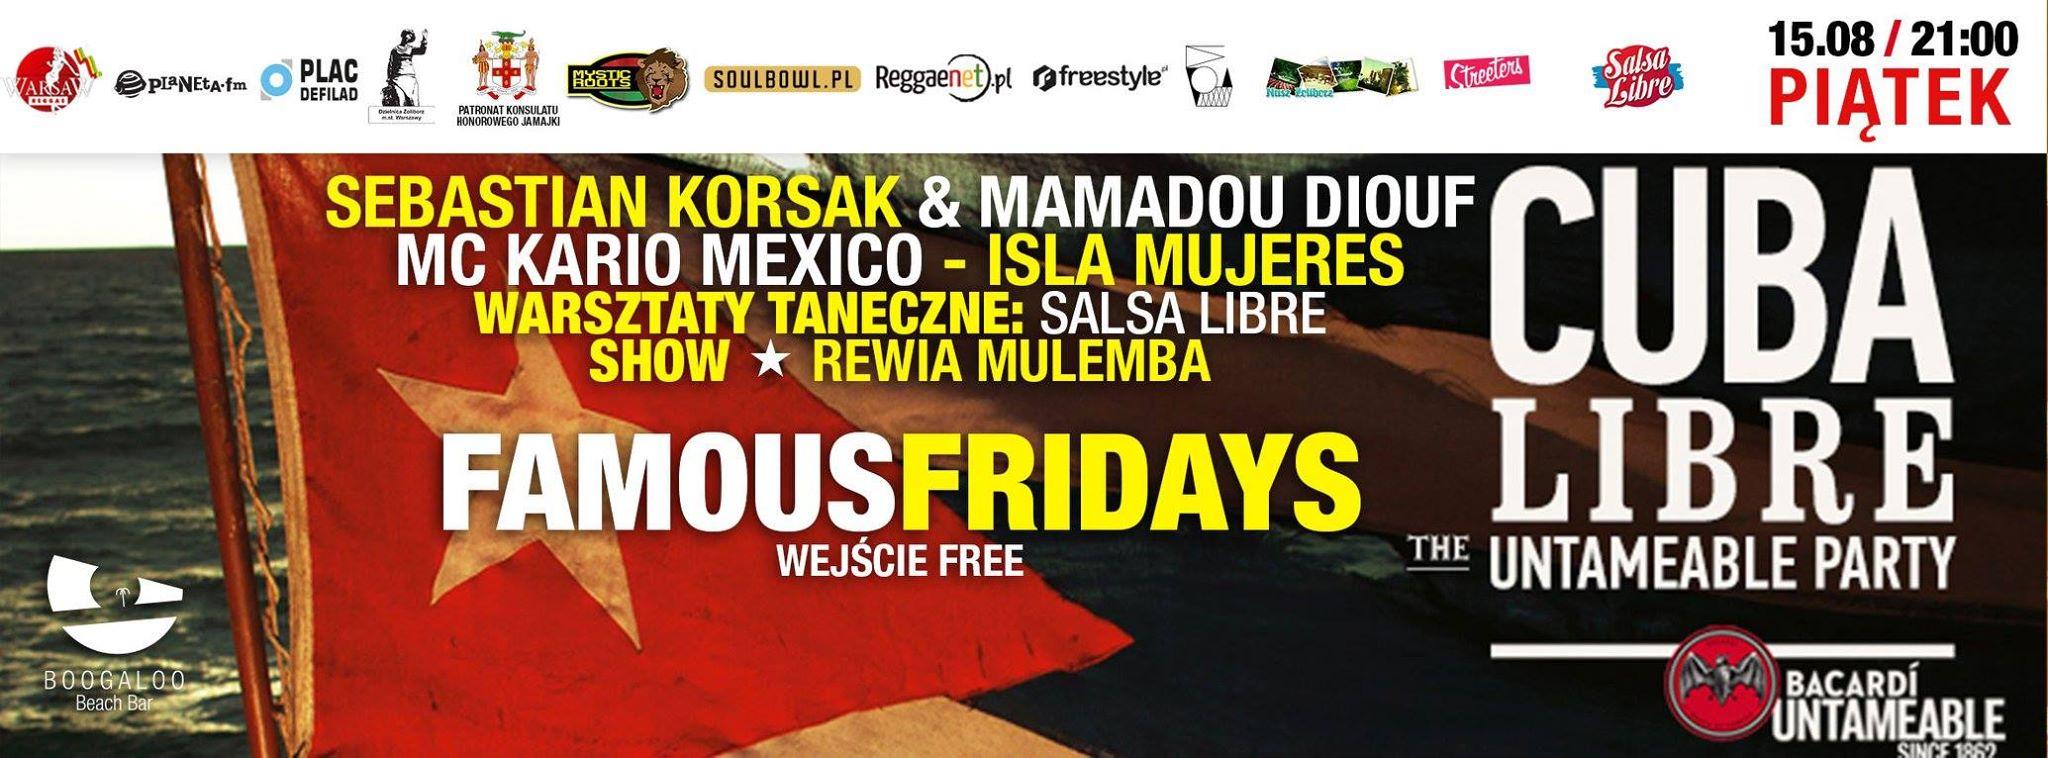 SEBASTIAN KORSAK & MAMADOU DIOUF & MC KARIO MEXICO (ISLA MUJERES)